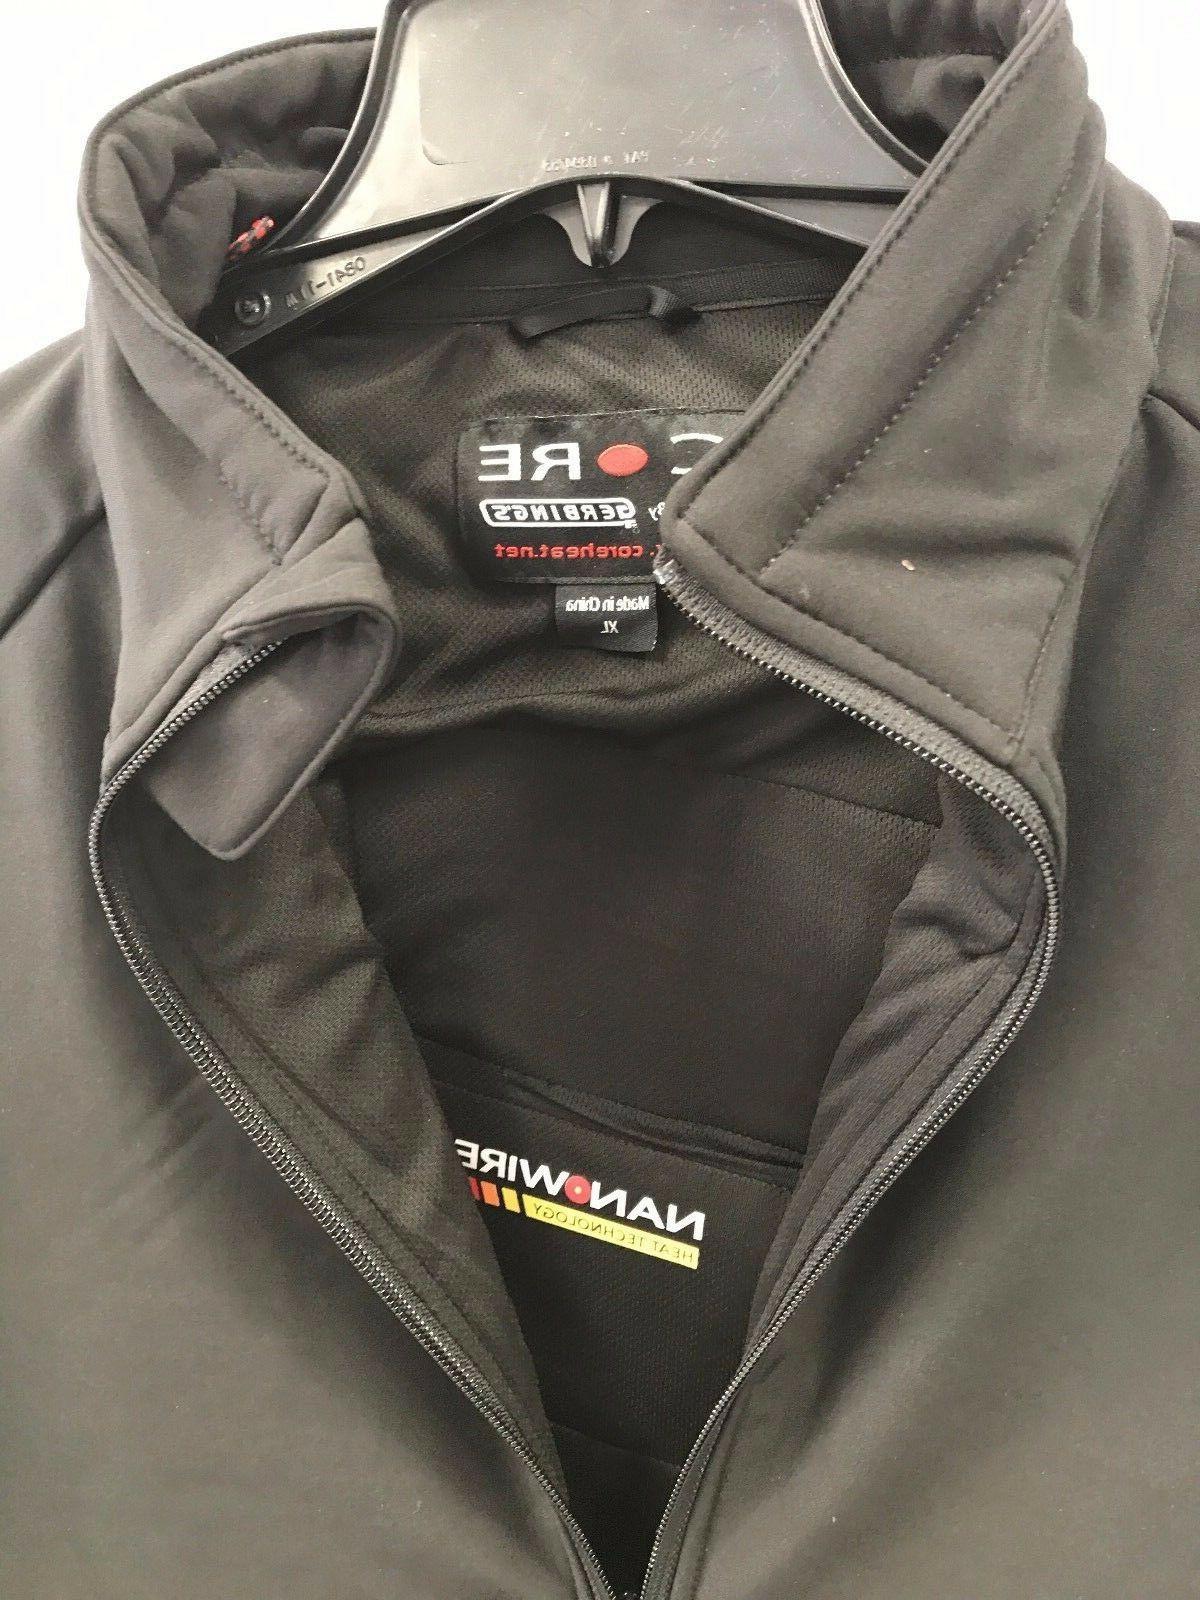 Gerbing Clothing Soft Shell Heat Men's Black Jacket Size MEDIUM